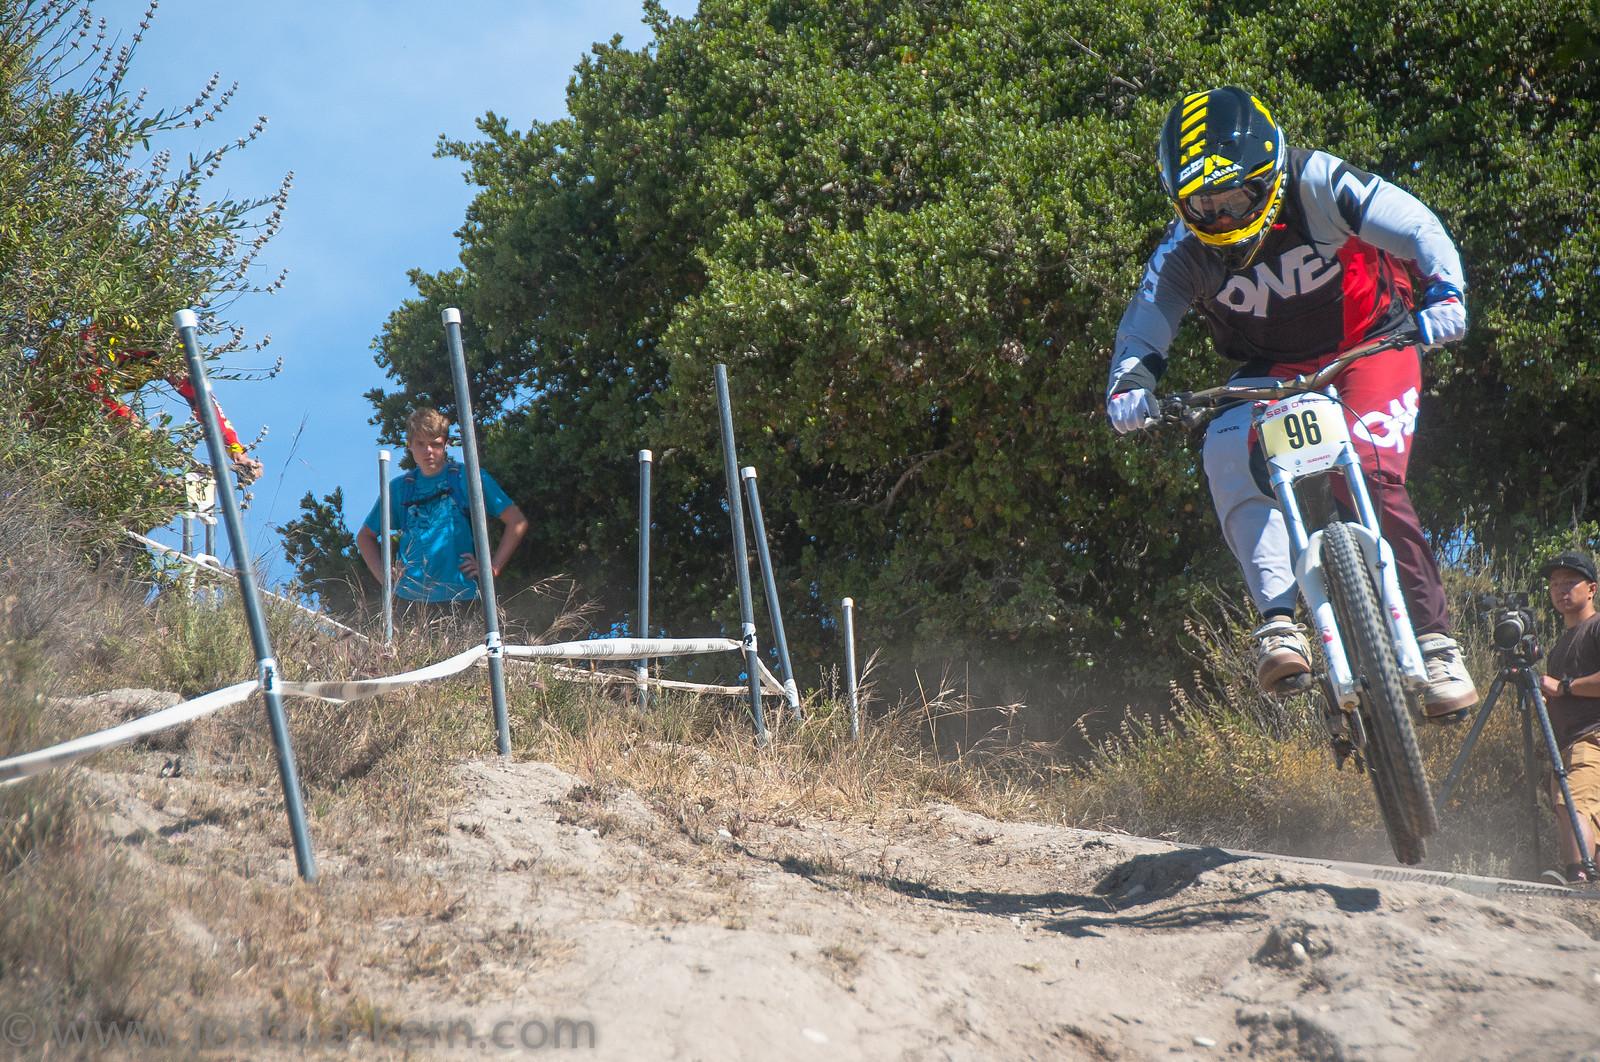 4-19-13DHPractice (35 of 36) - jkern620 - Mountain Biking Pictures - Vital MTB